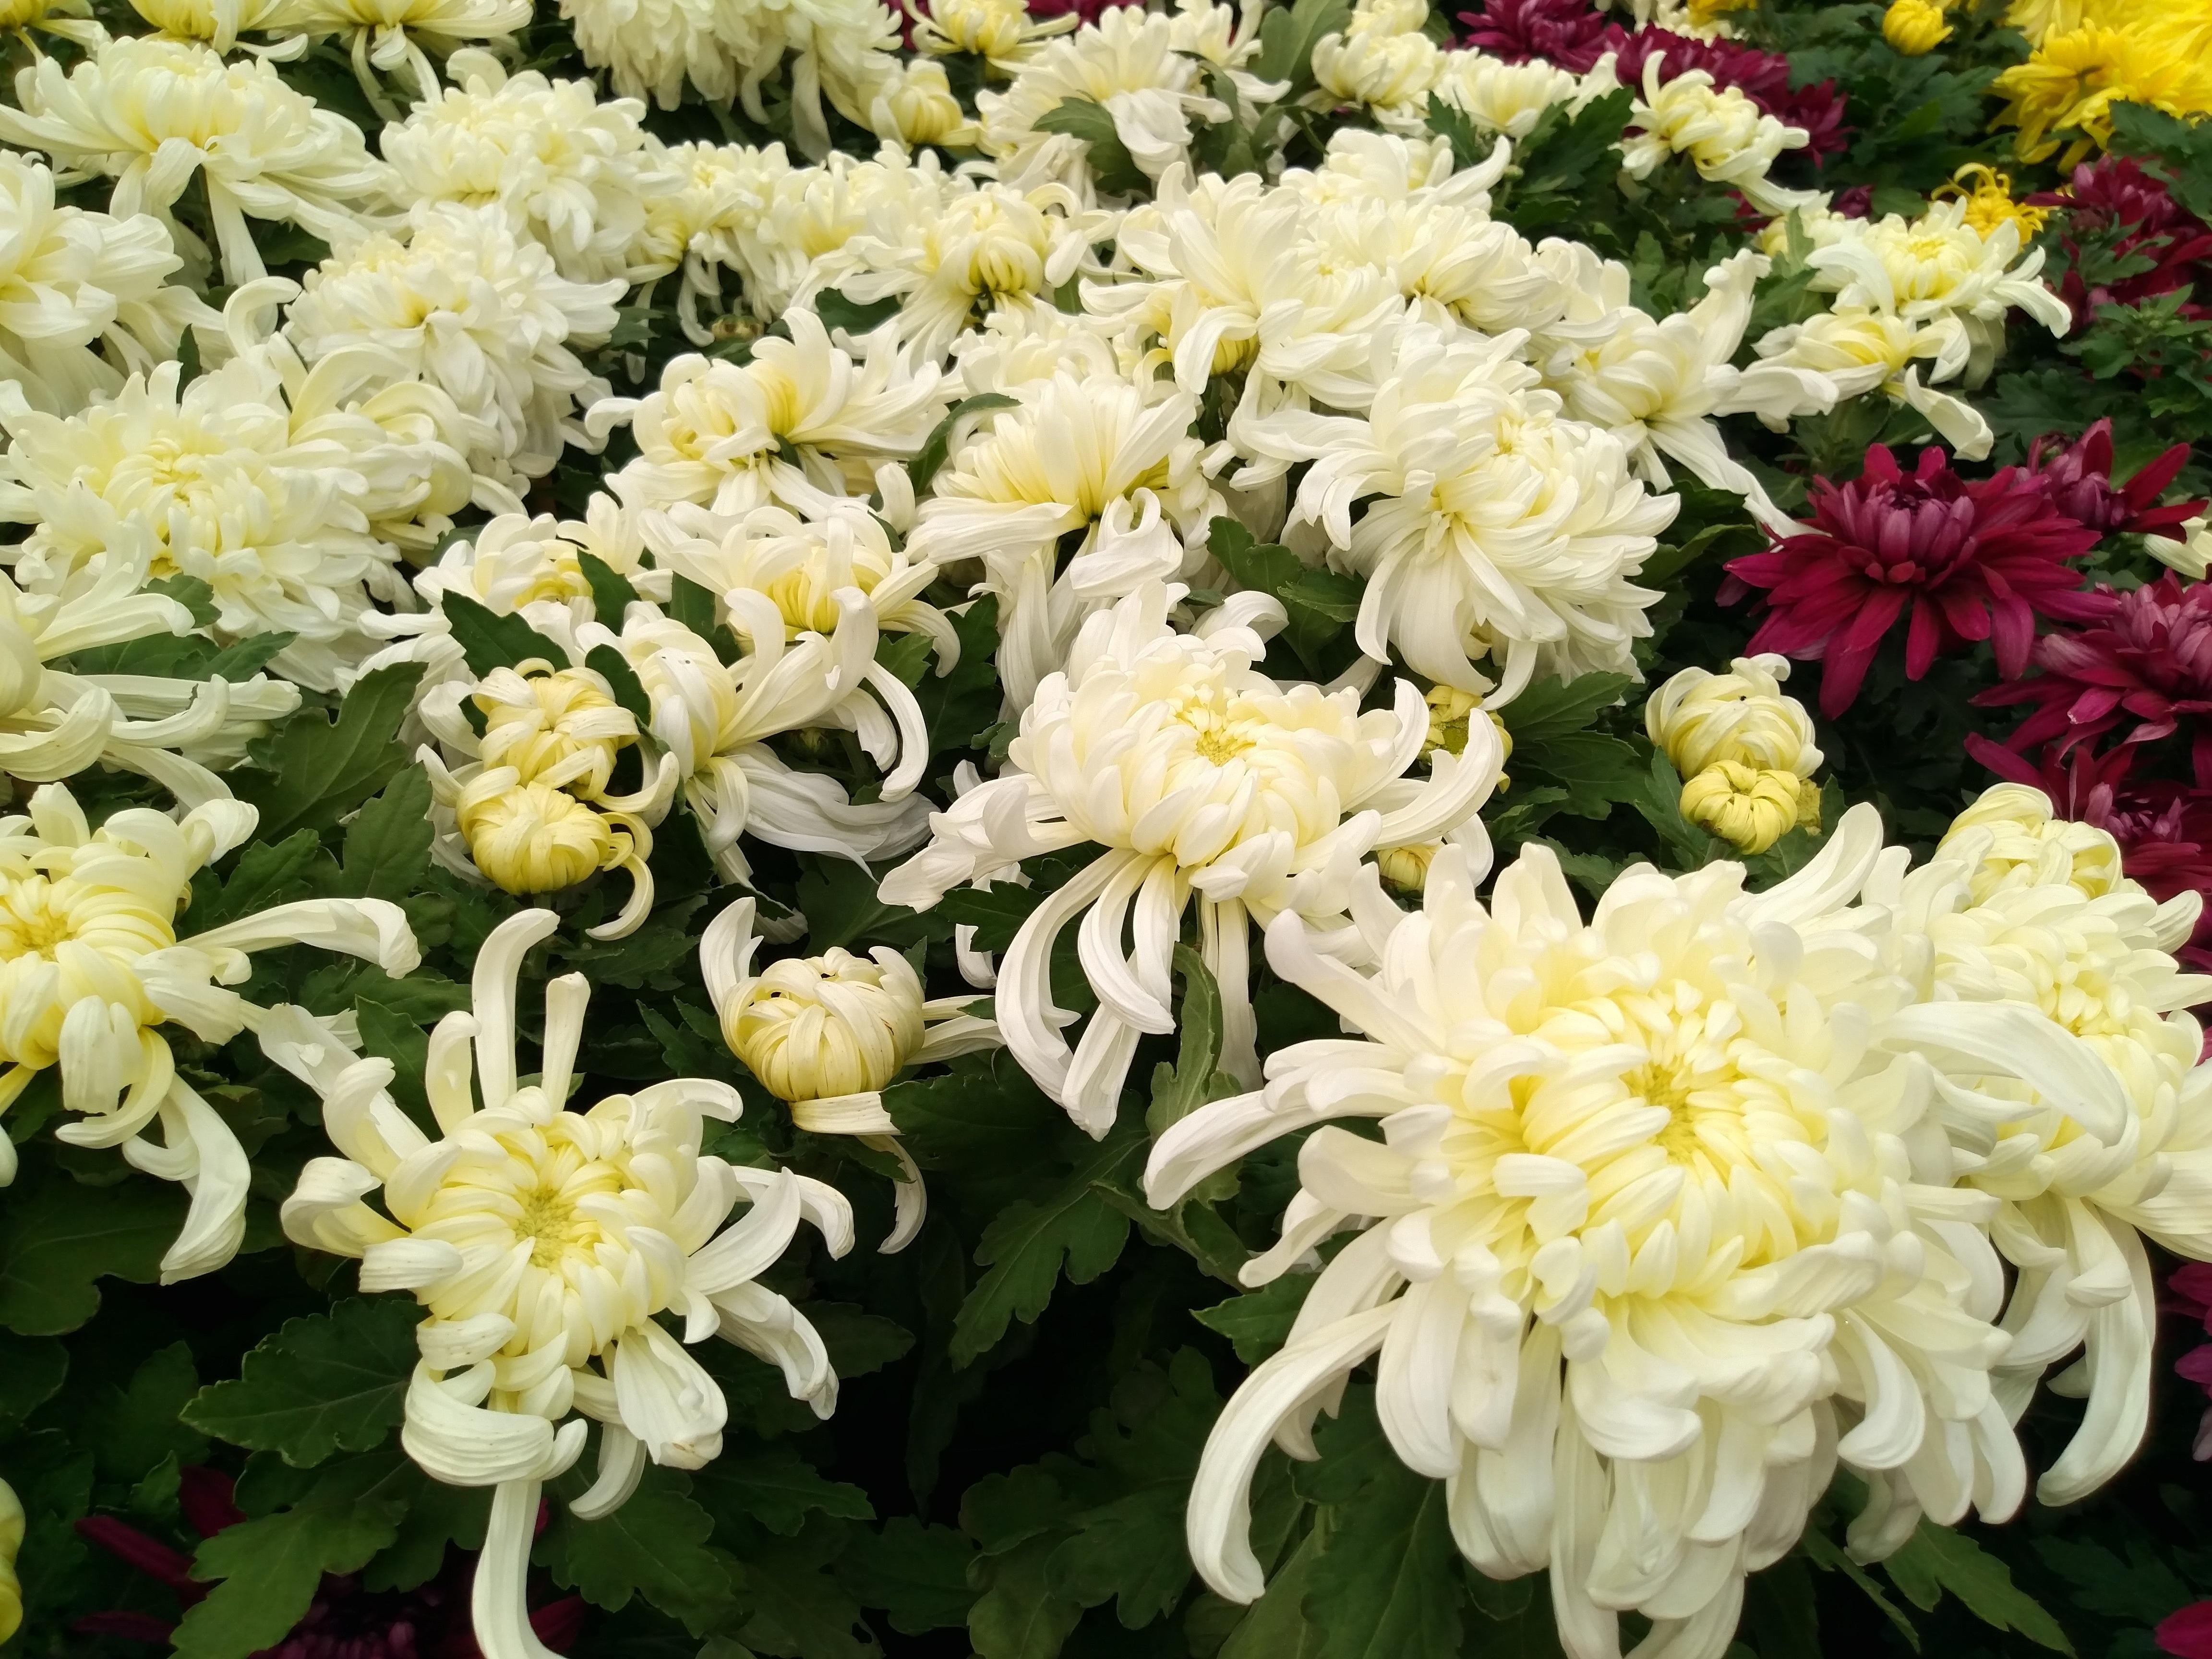 Banco de imagens plantar flor arbusto cris ntemo - Como cultivar crisantemos ...